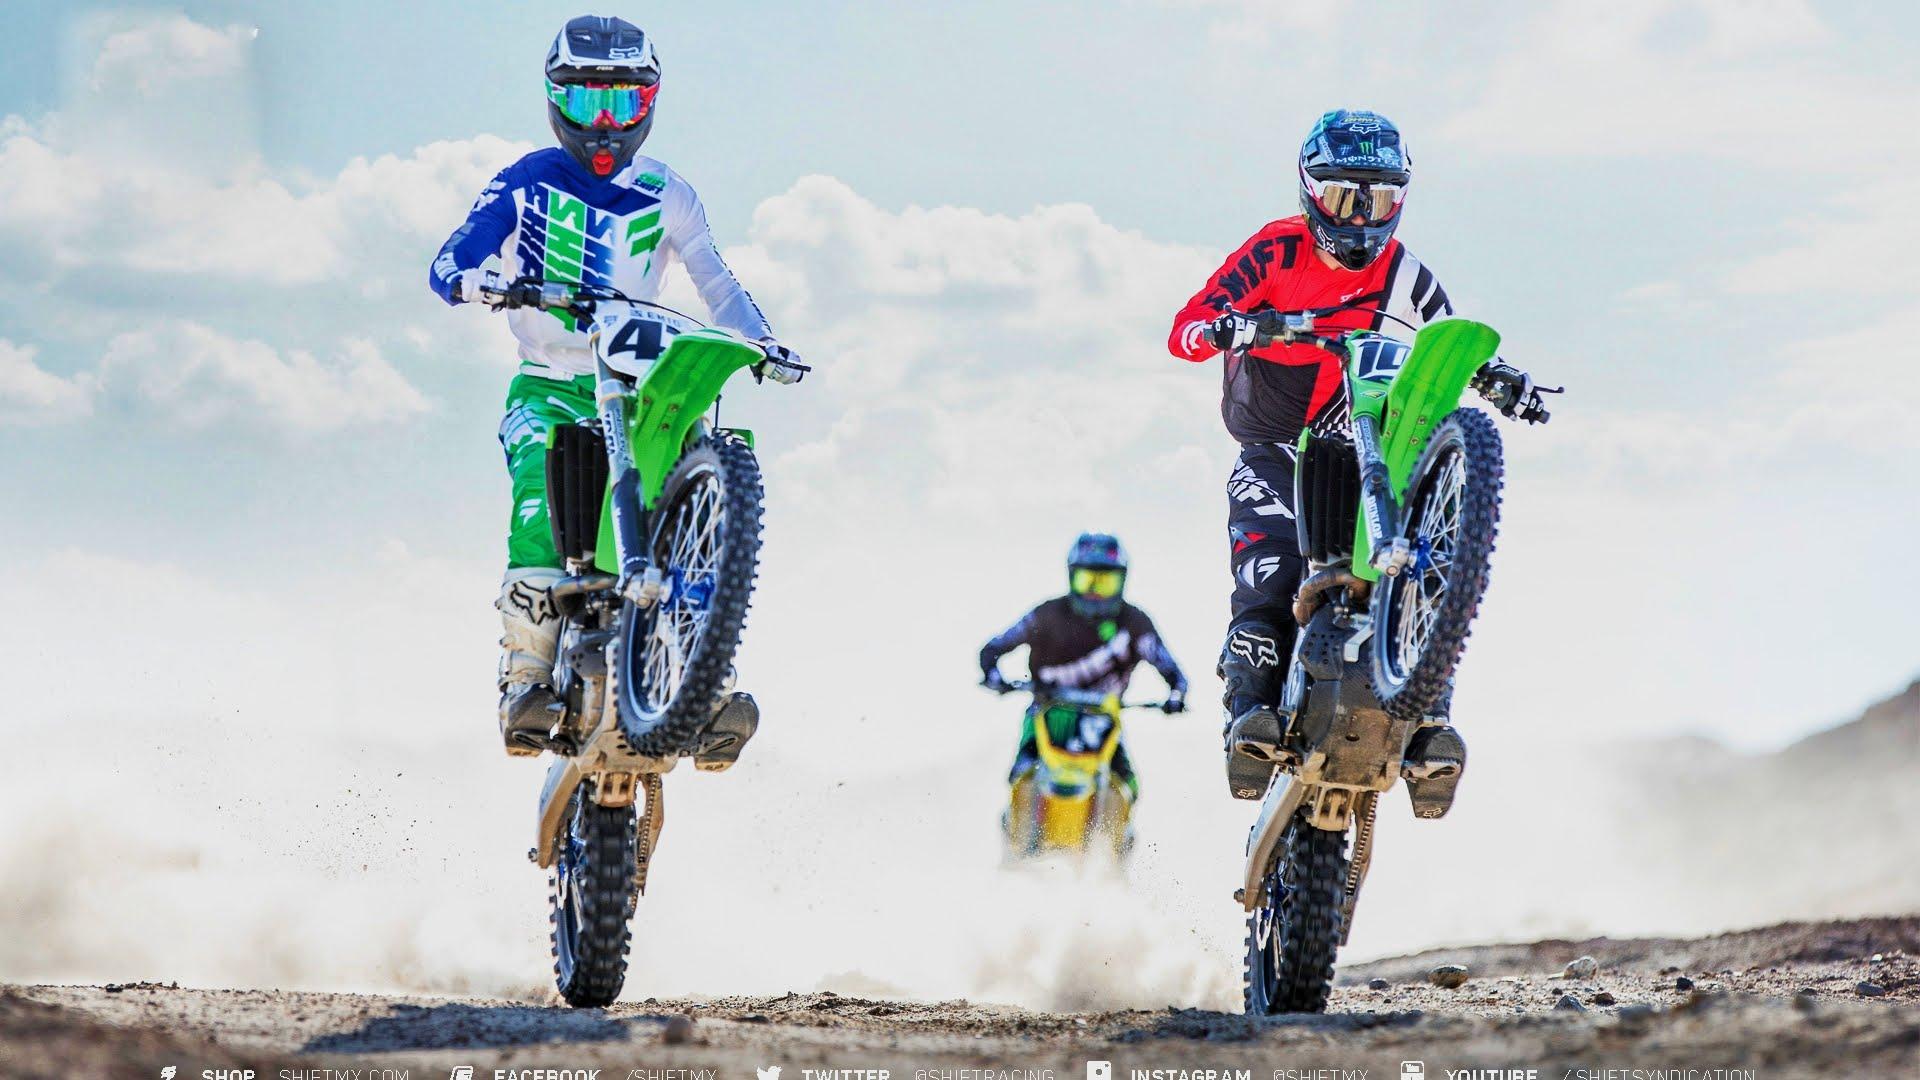 Motocross 2015 1920x1080